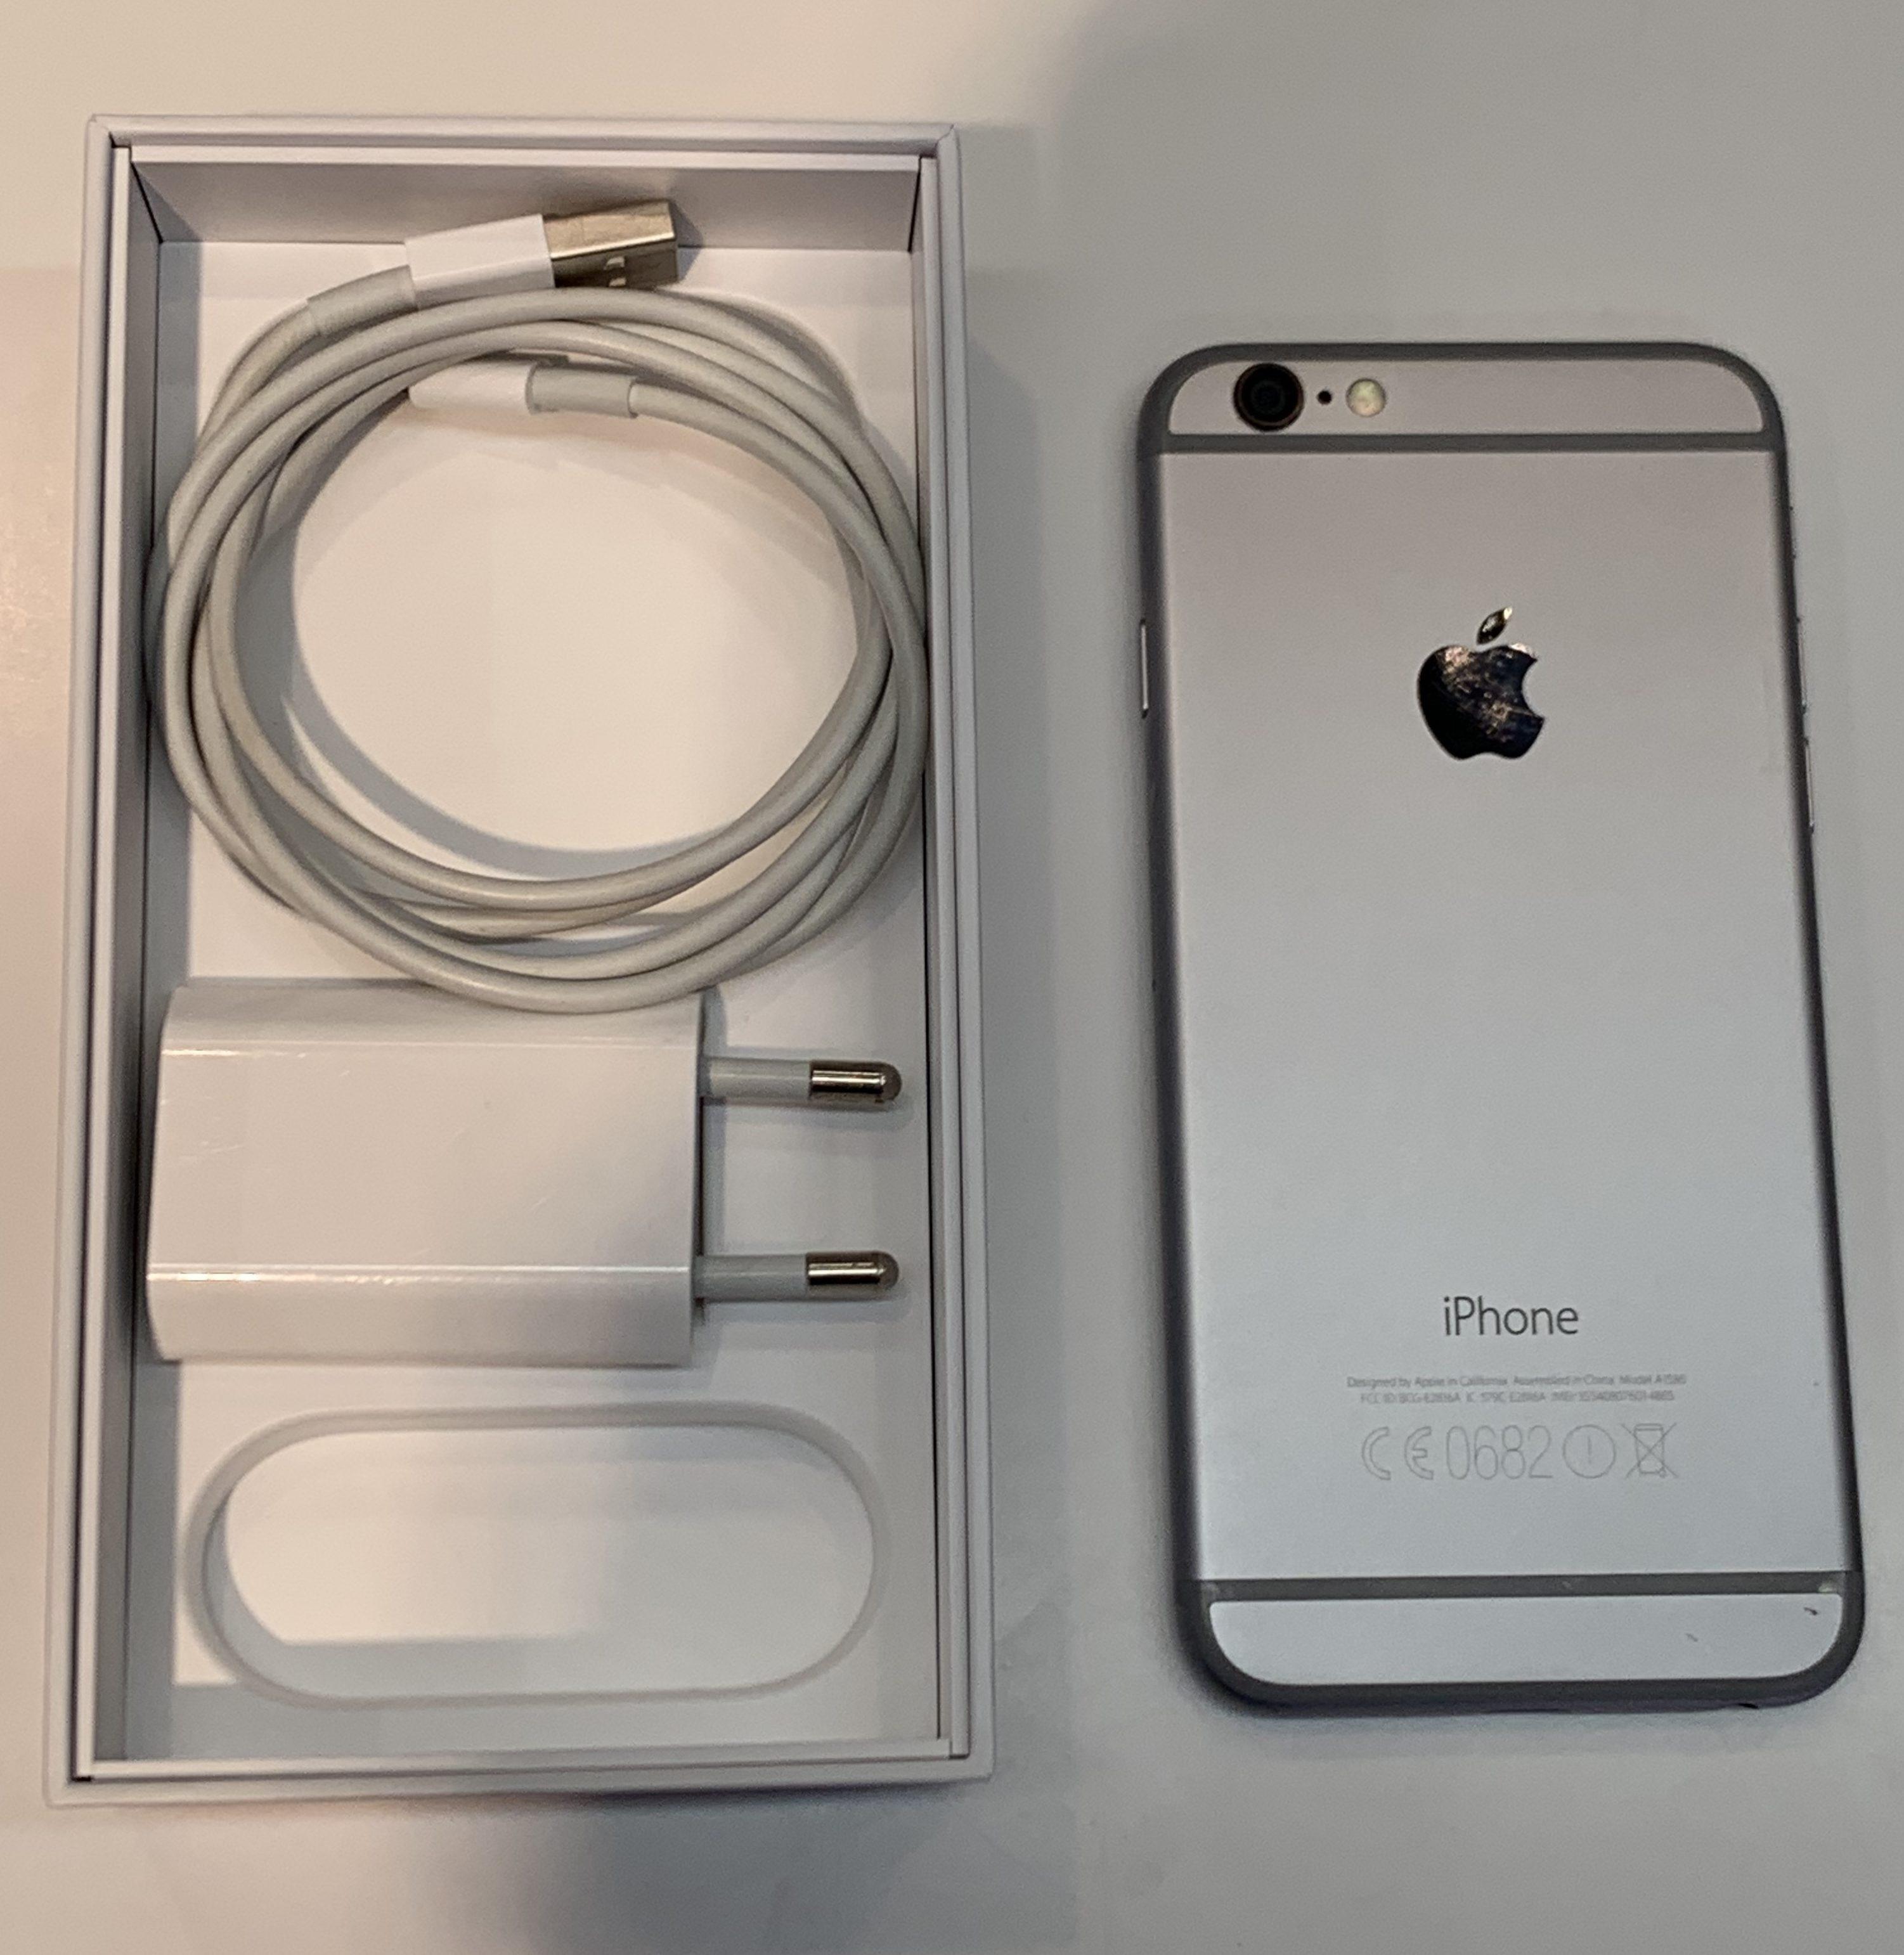 iPhone 6 32GB, 32 GB, Space Gray, obraz 6